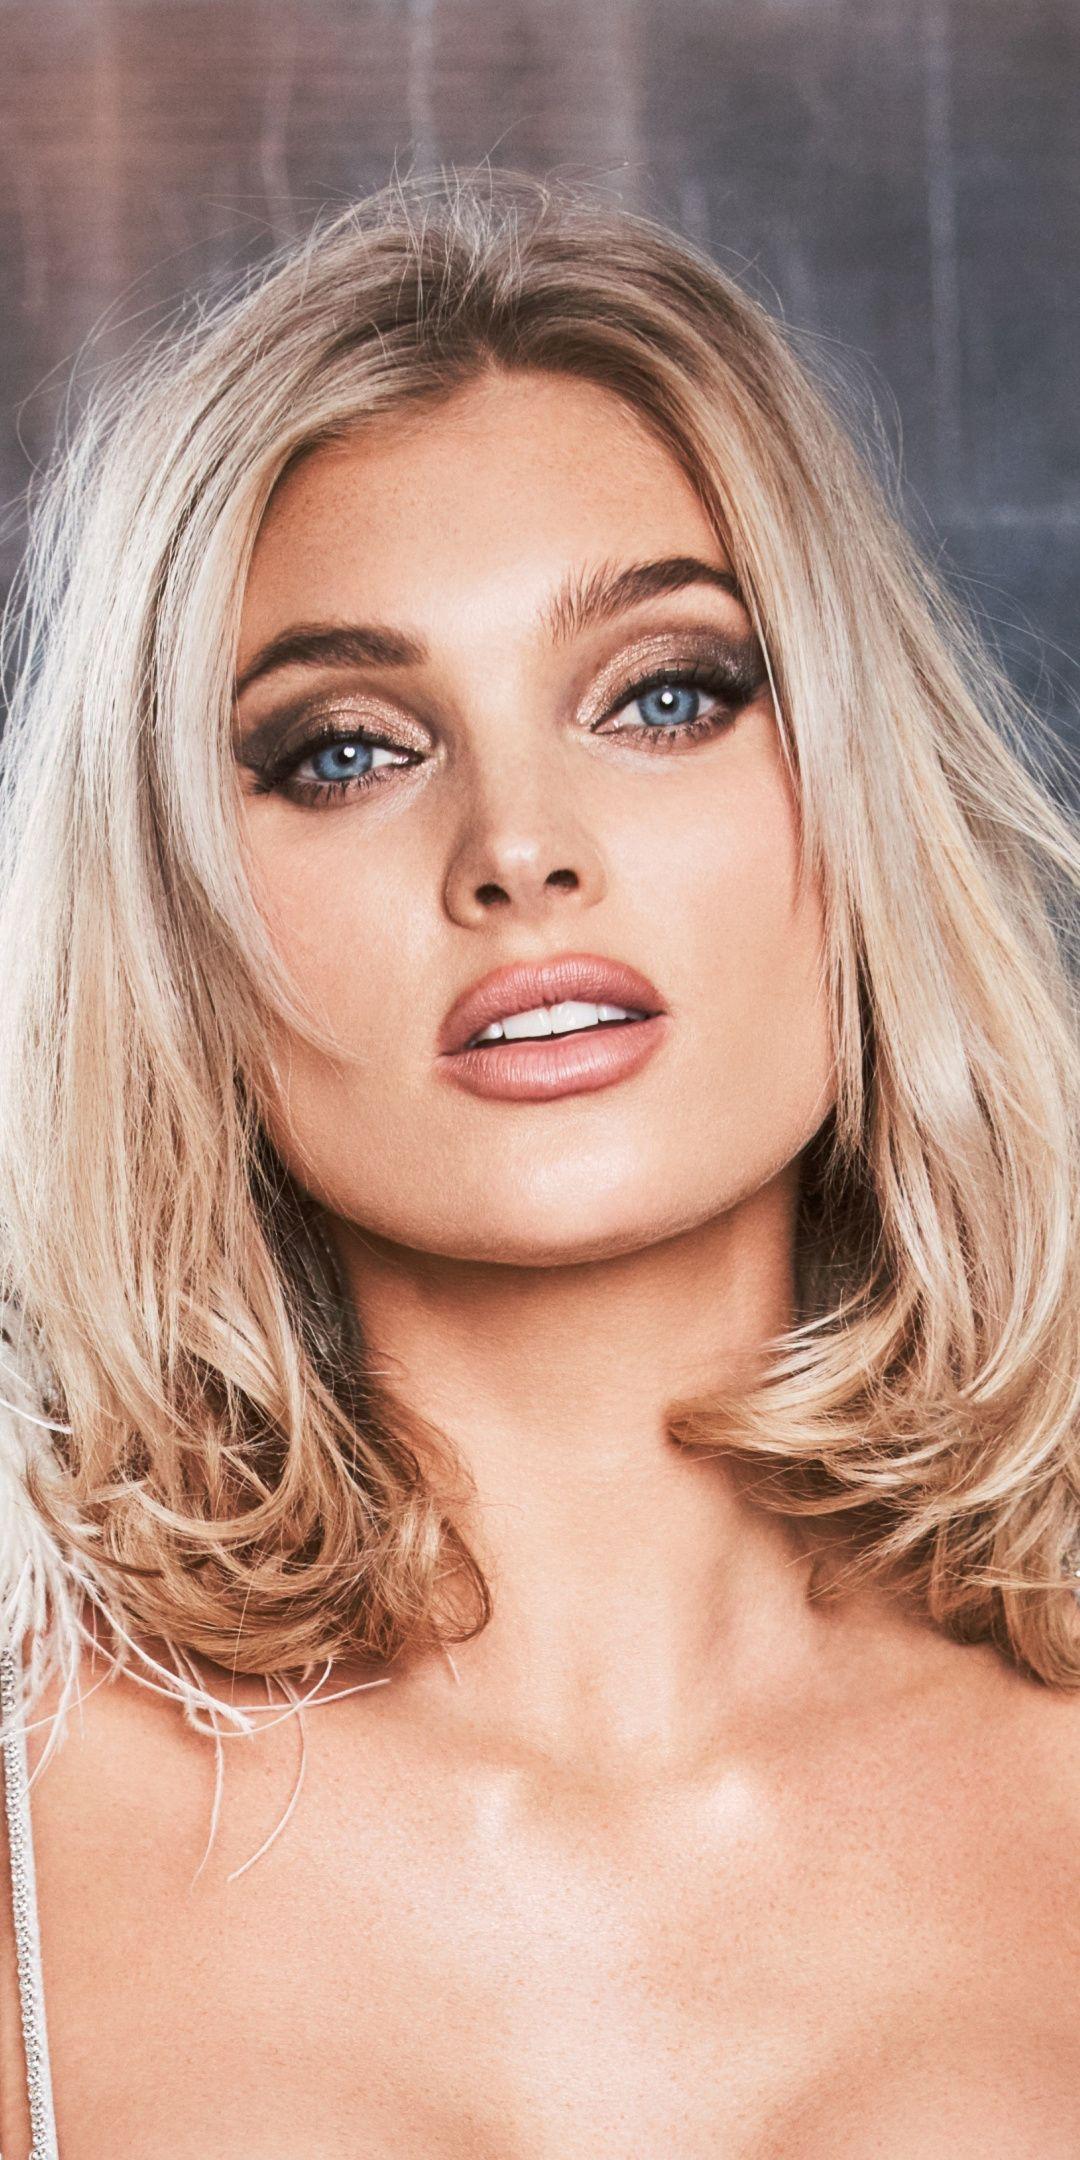 Elsa Hosk Hot And Beautiful Supermodel 1080x2160 Wallpaper Elsa Hosk Girl Iphone Wallpaper Beautiful Girl Wallpaper